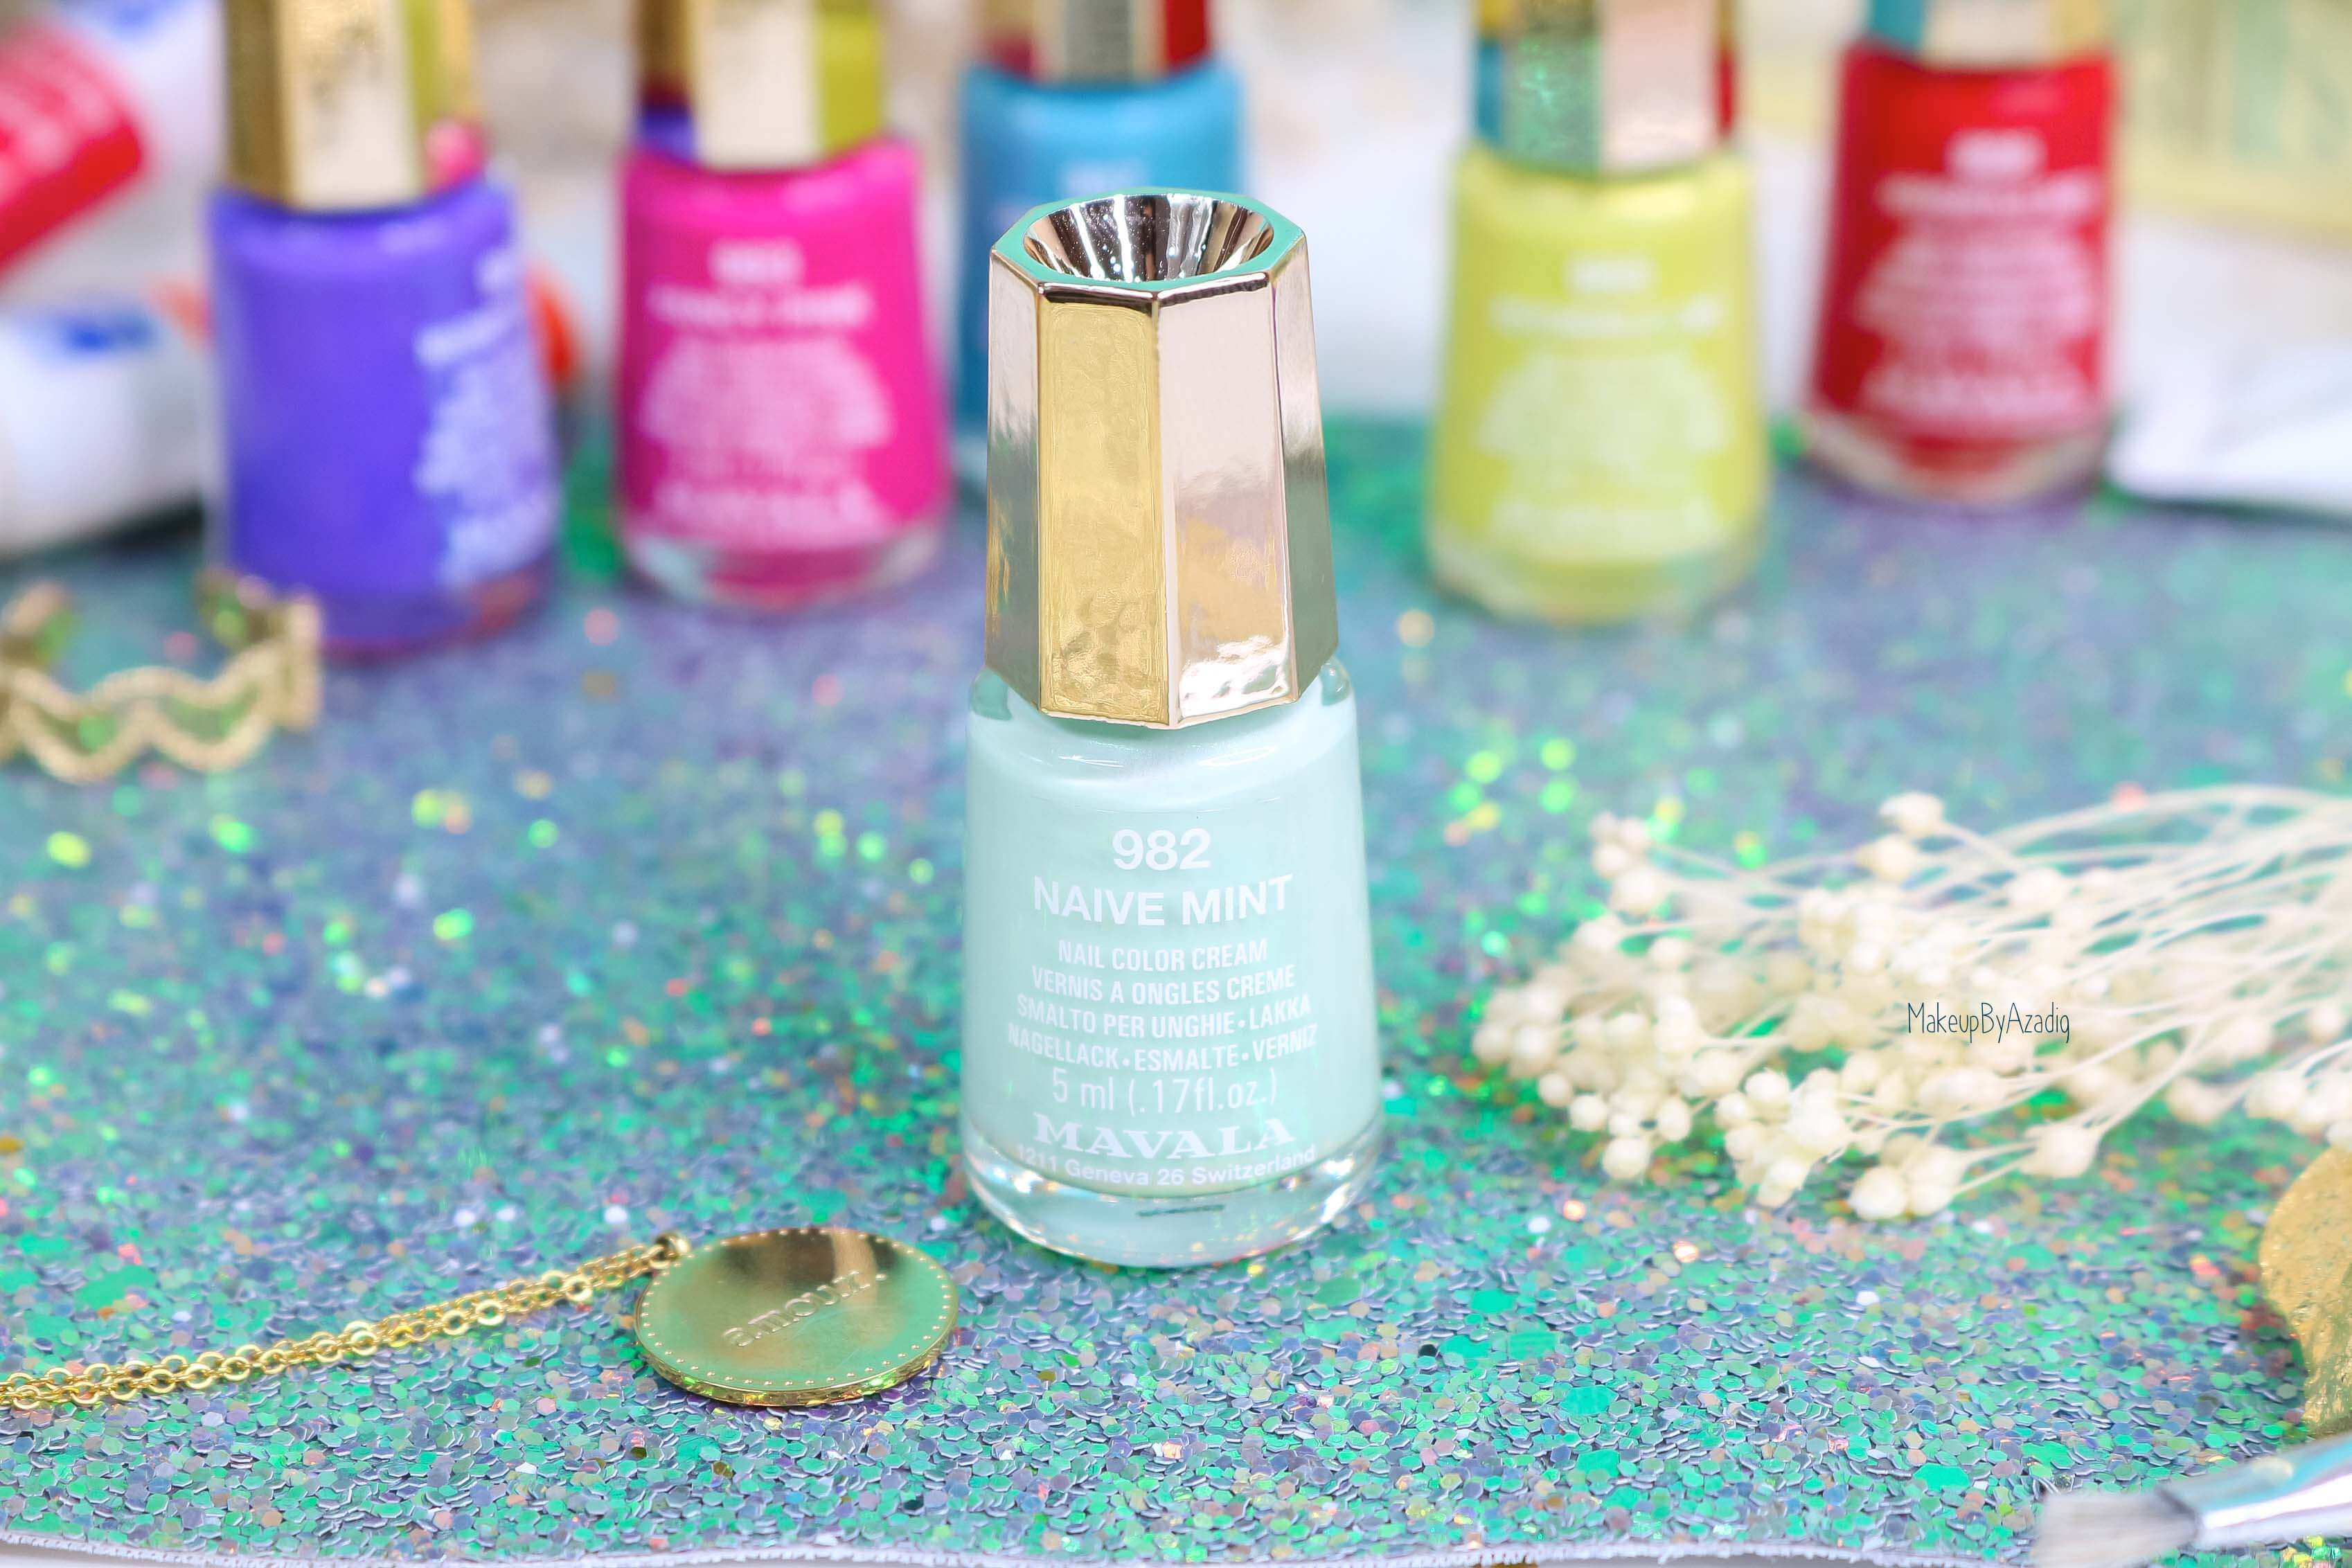 revue-collection-vernis-mavala-nails-dash-splash-ete-2019-bleu-orange-makeupbyazadig-swatch-avis-prix-mint